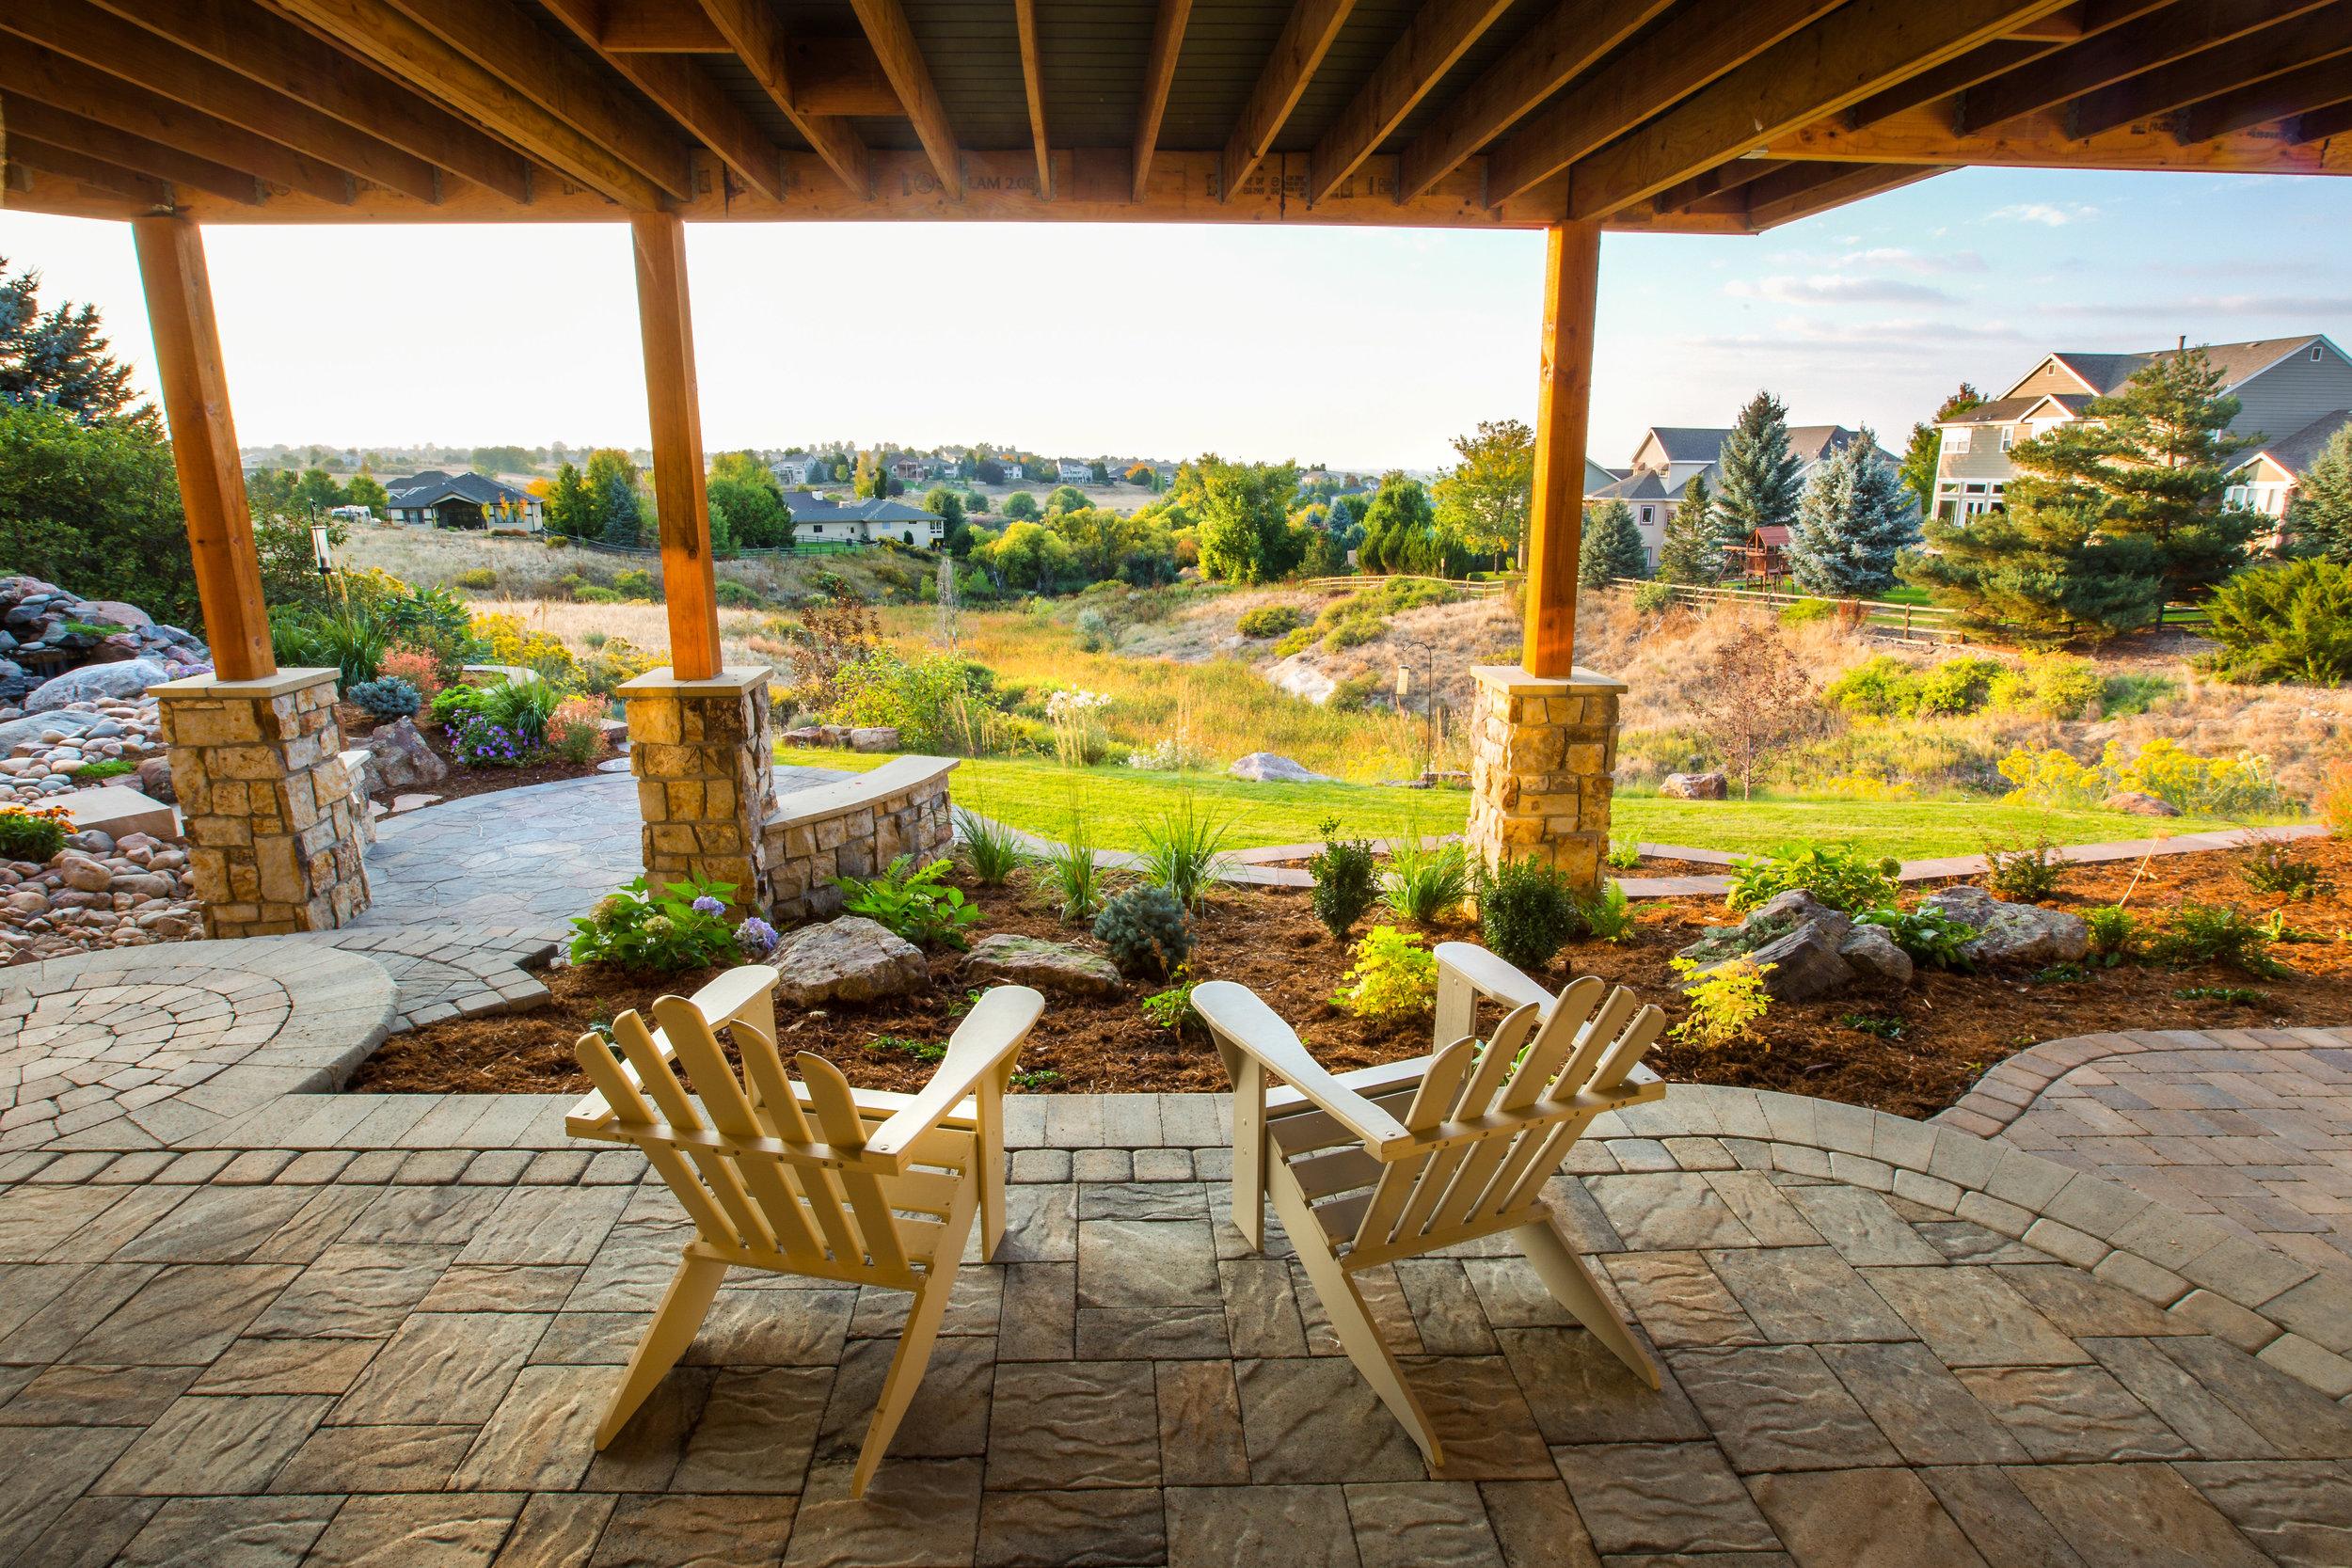 Zak George Landscaping - Residential Landscape Design & Install-3.jpg